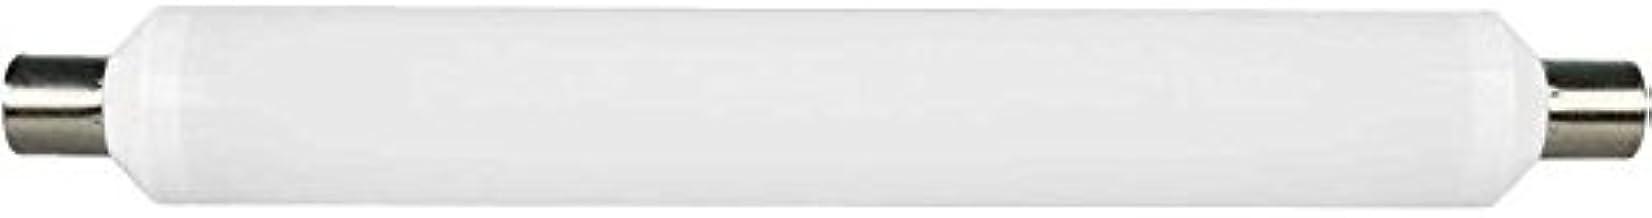 Sylvania 0026851 Toledo Striplight V2 Classic 31.2 x 4 x 3.9 cm Bianco